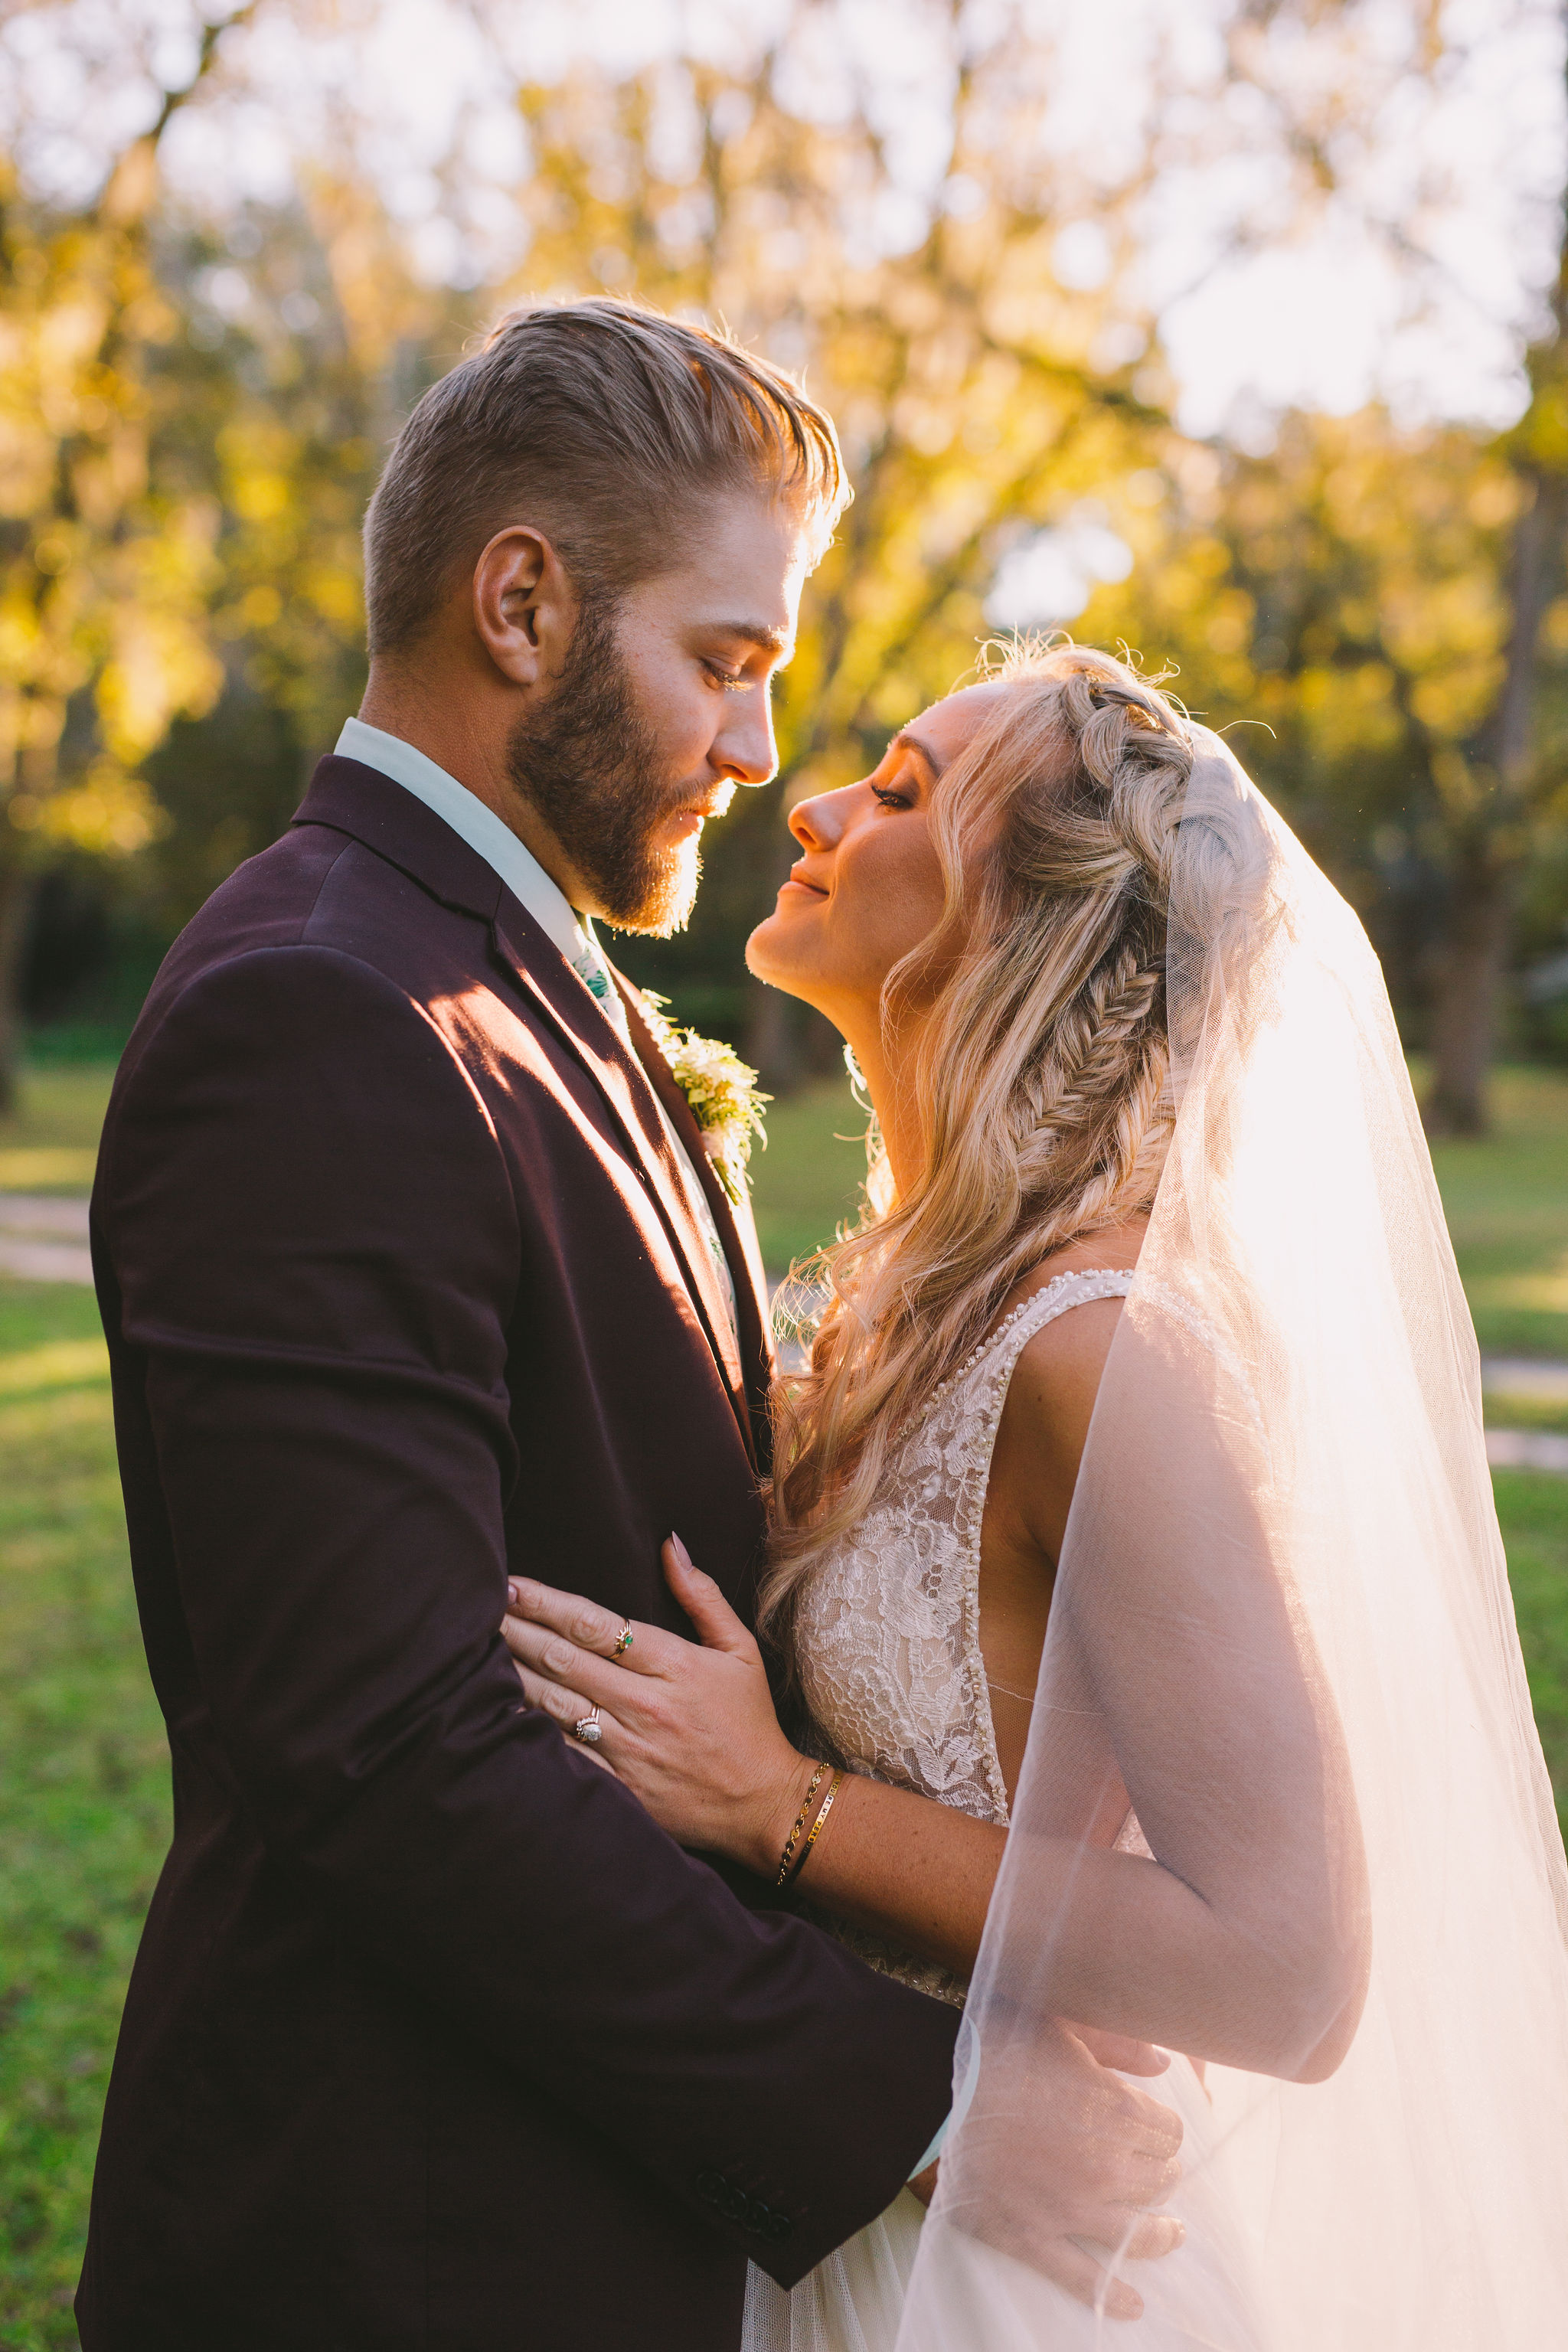 Jesseandlex_181103_AlexisNate_Wedding_BrideGroom_201.jpg